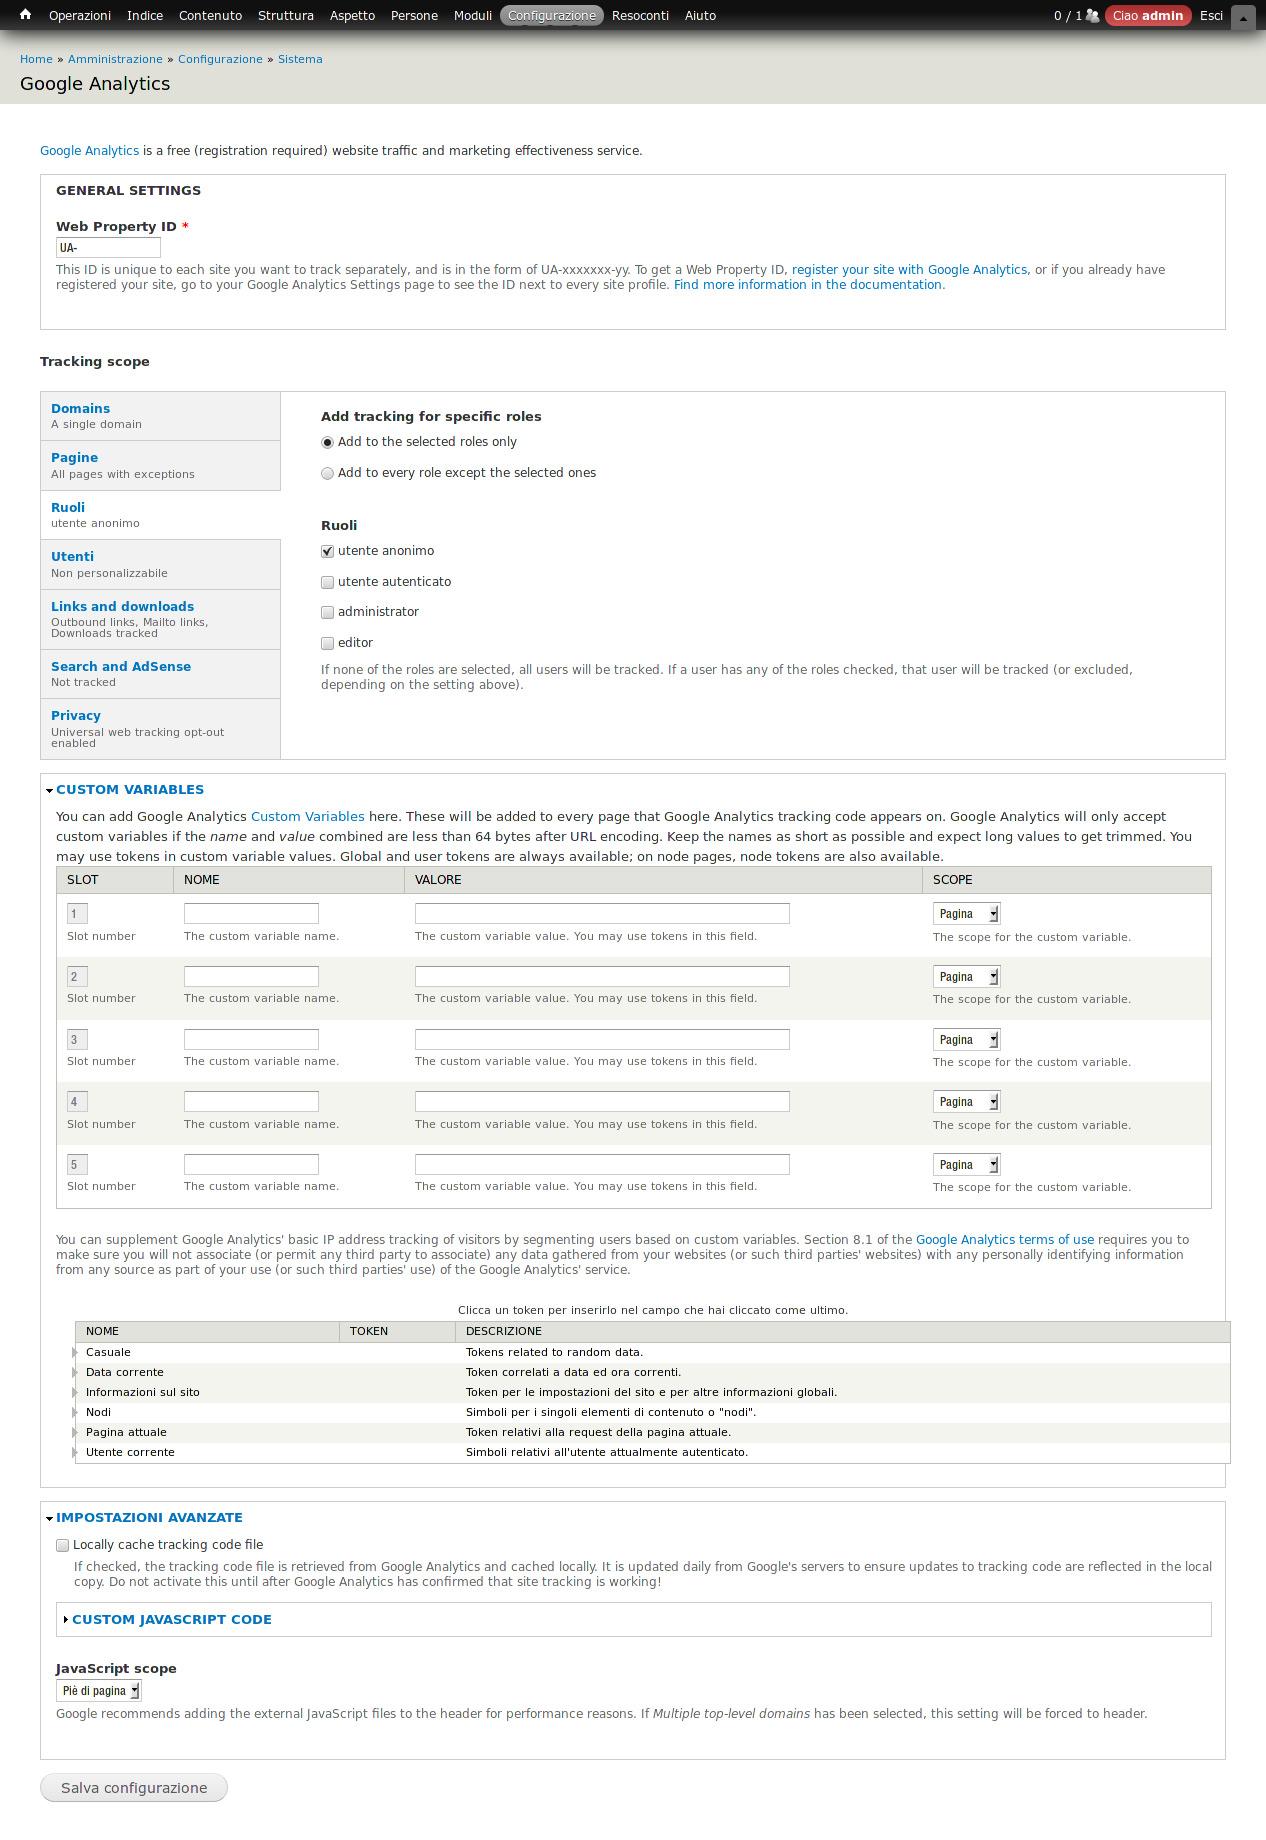 SEO: Modulo Drupal 7 per Google Analytics